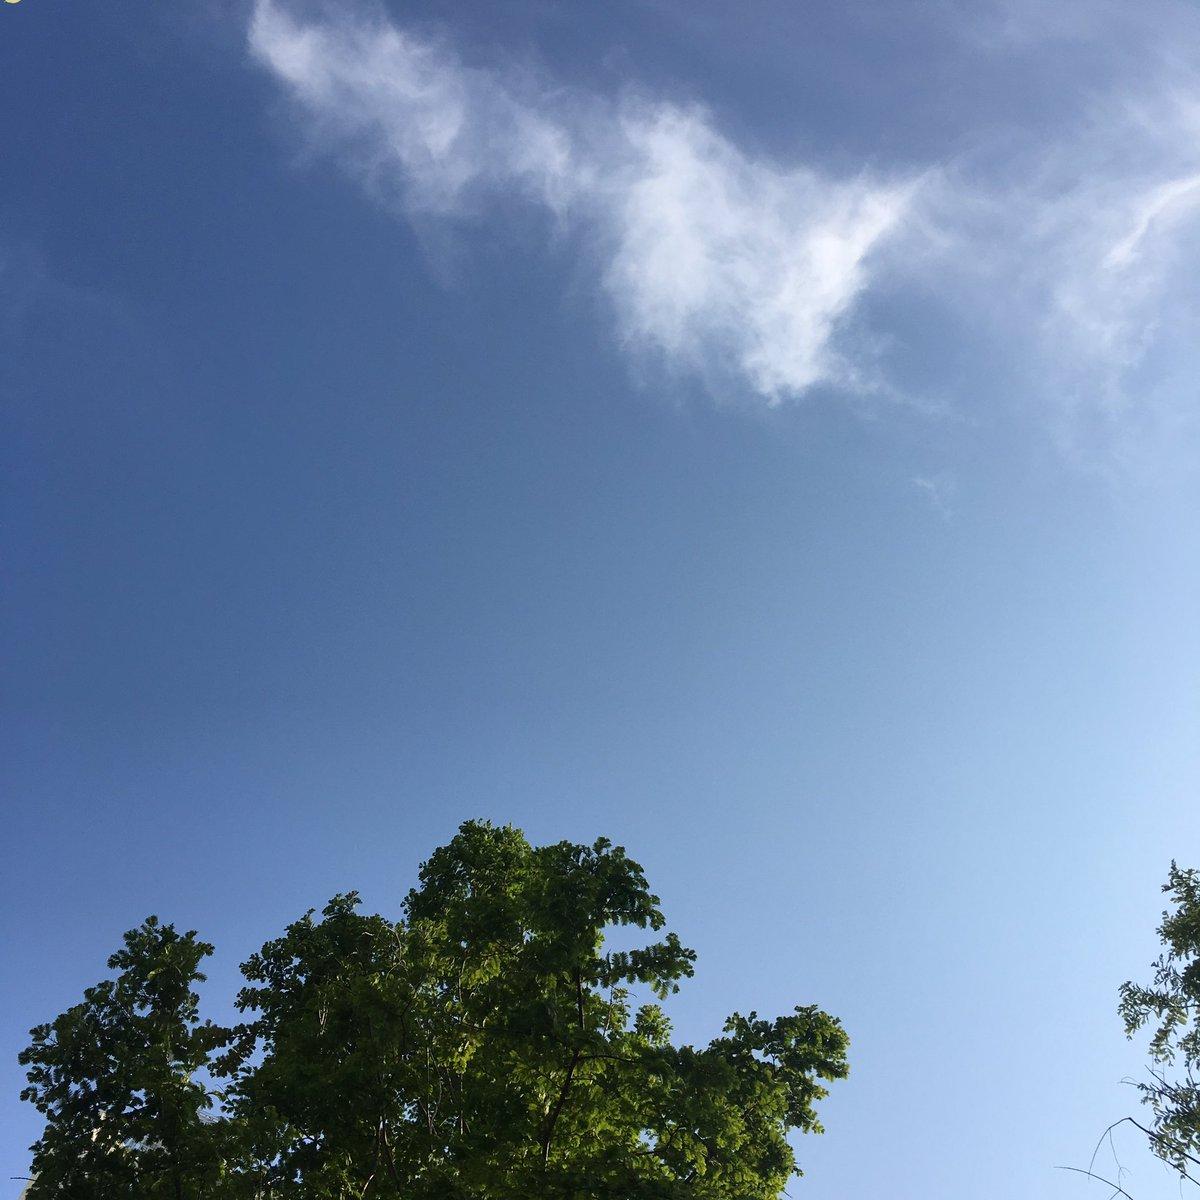 #clouds #sky #JK https://t.co/P0sUfcKglg